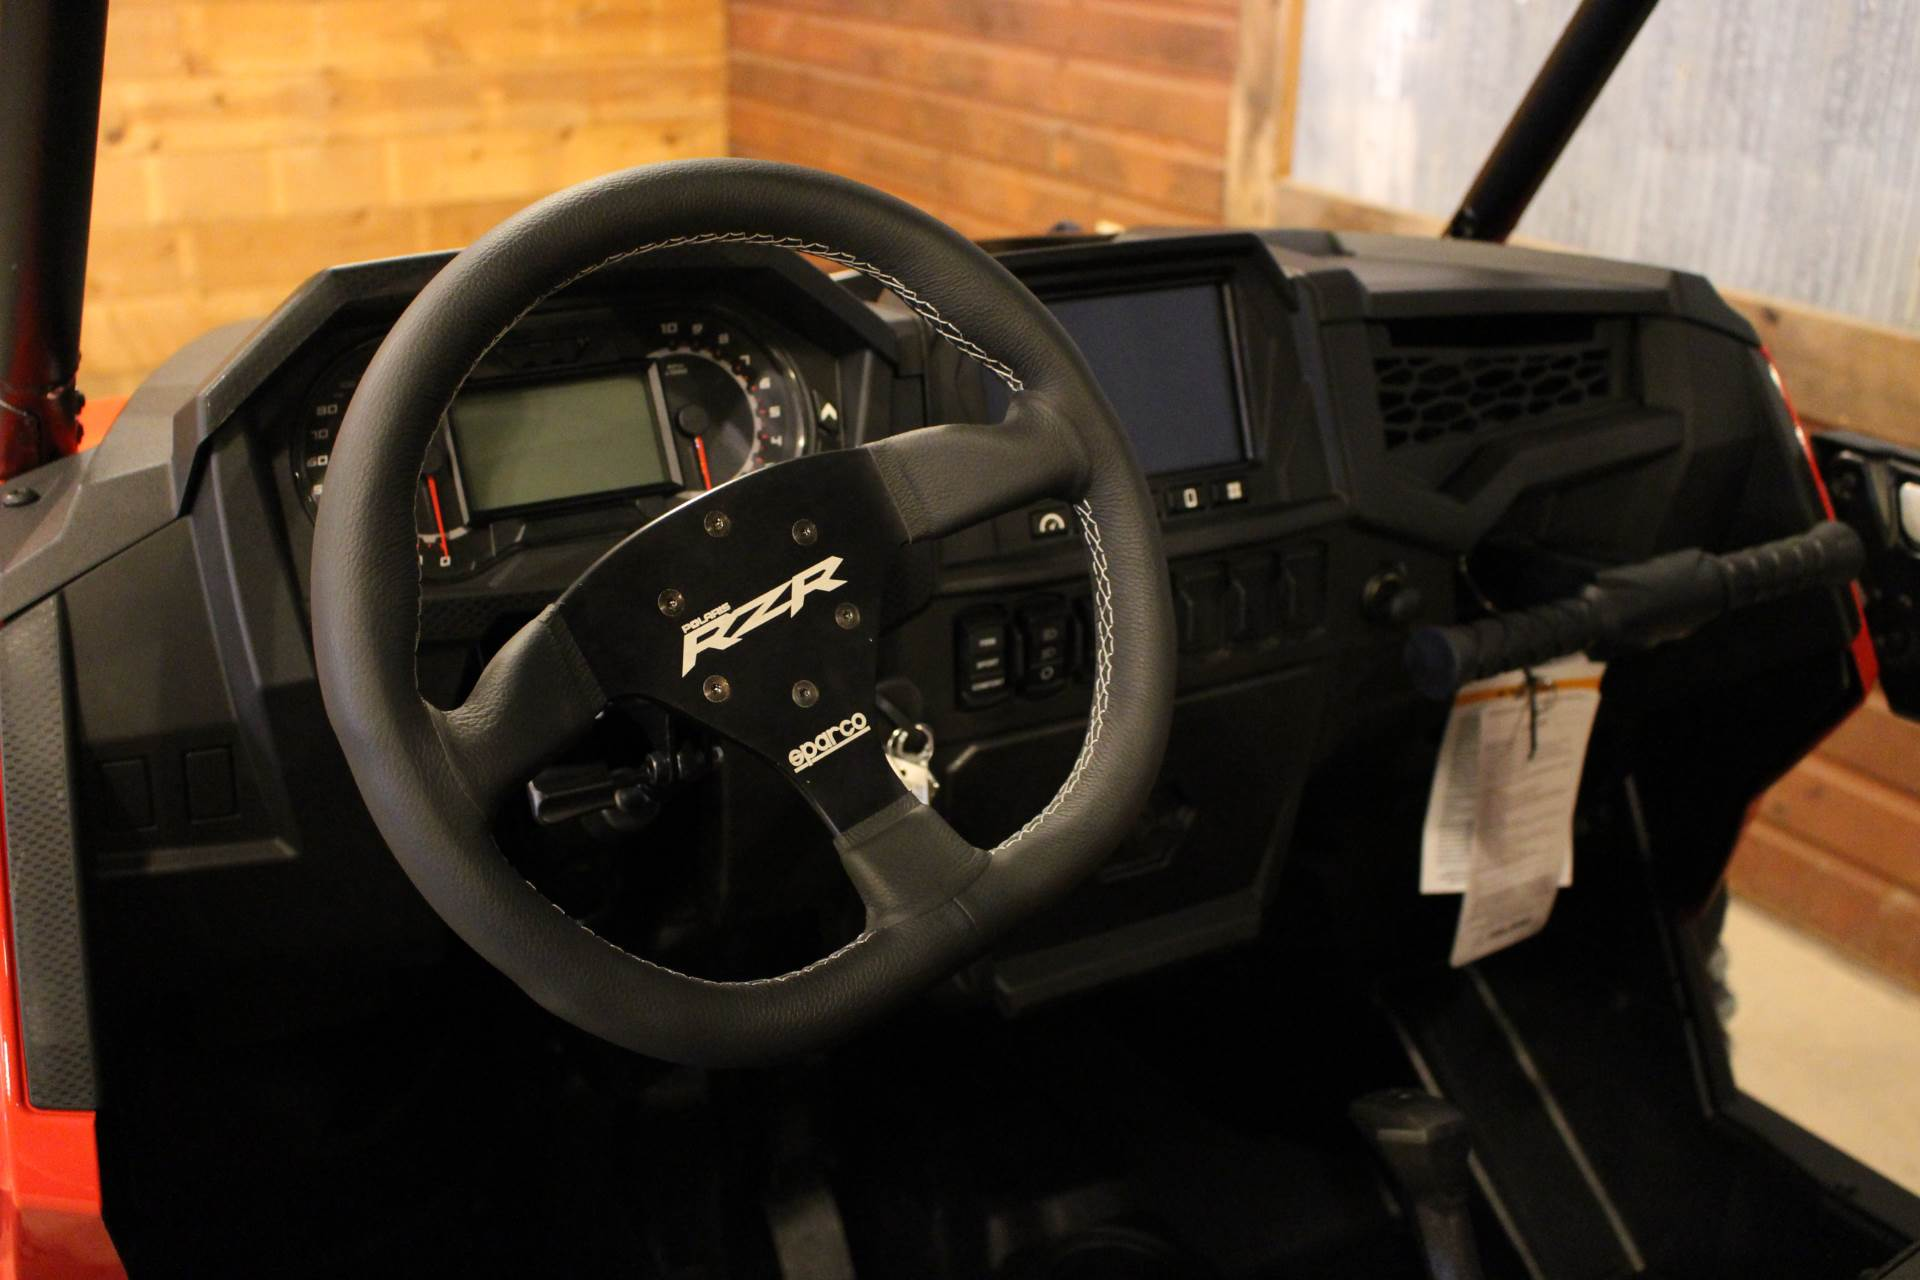 2018 Polaris RZR XP Turbo S 9